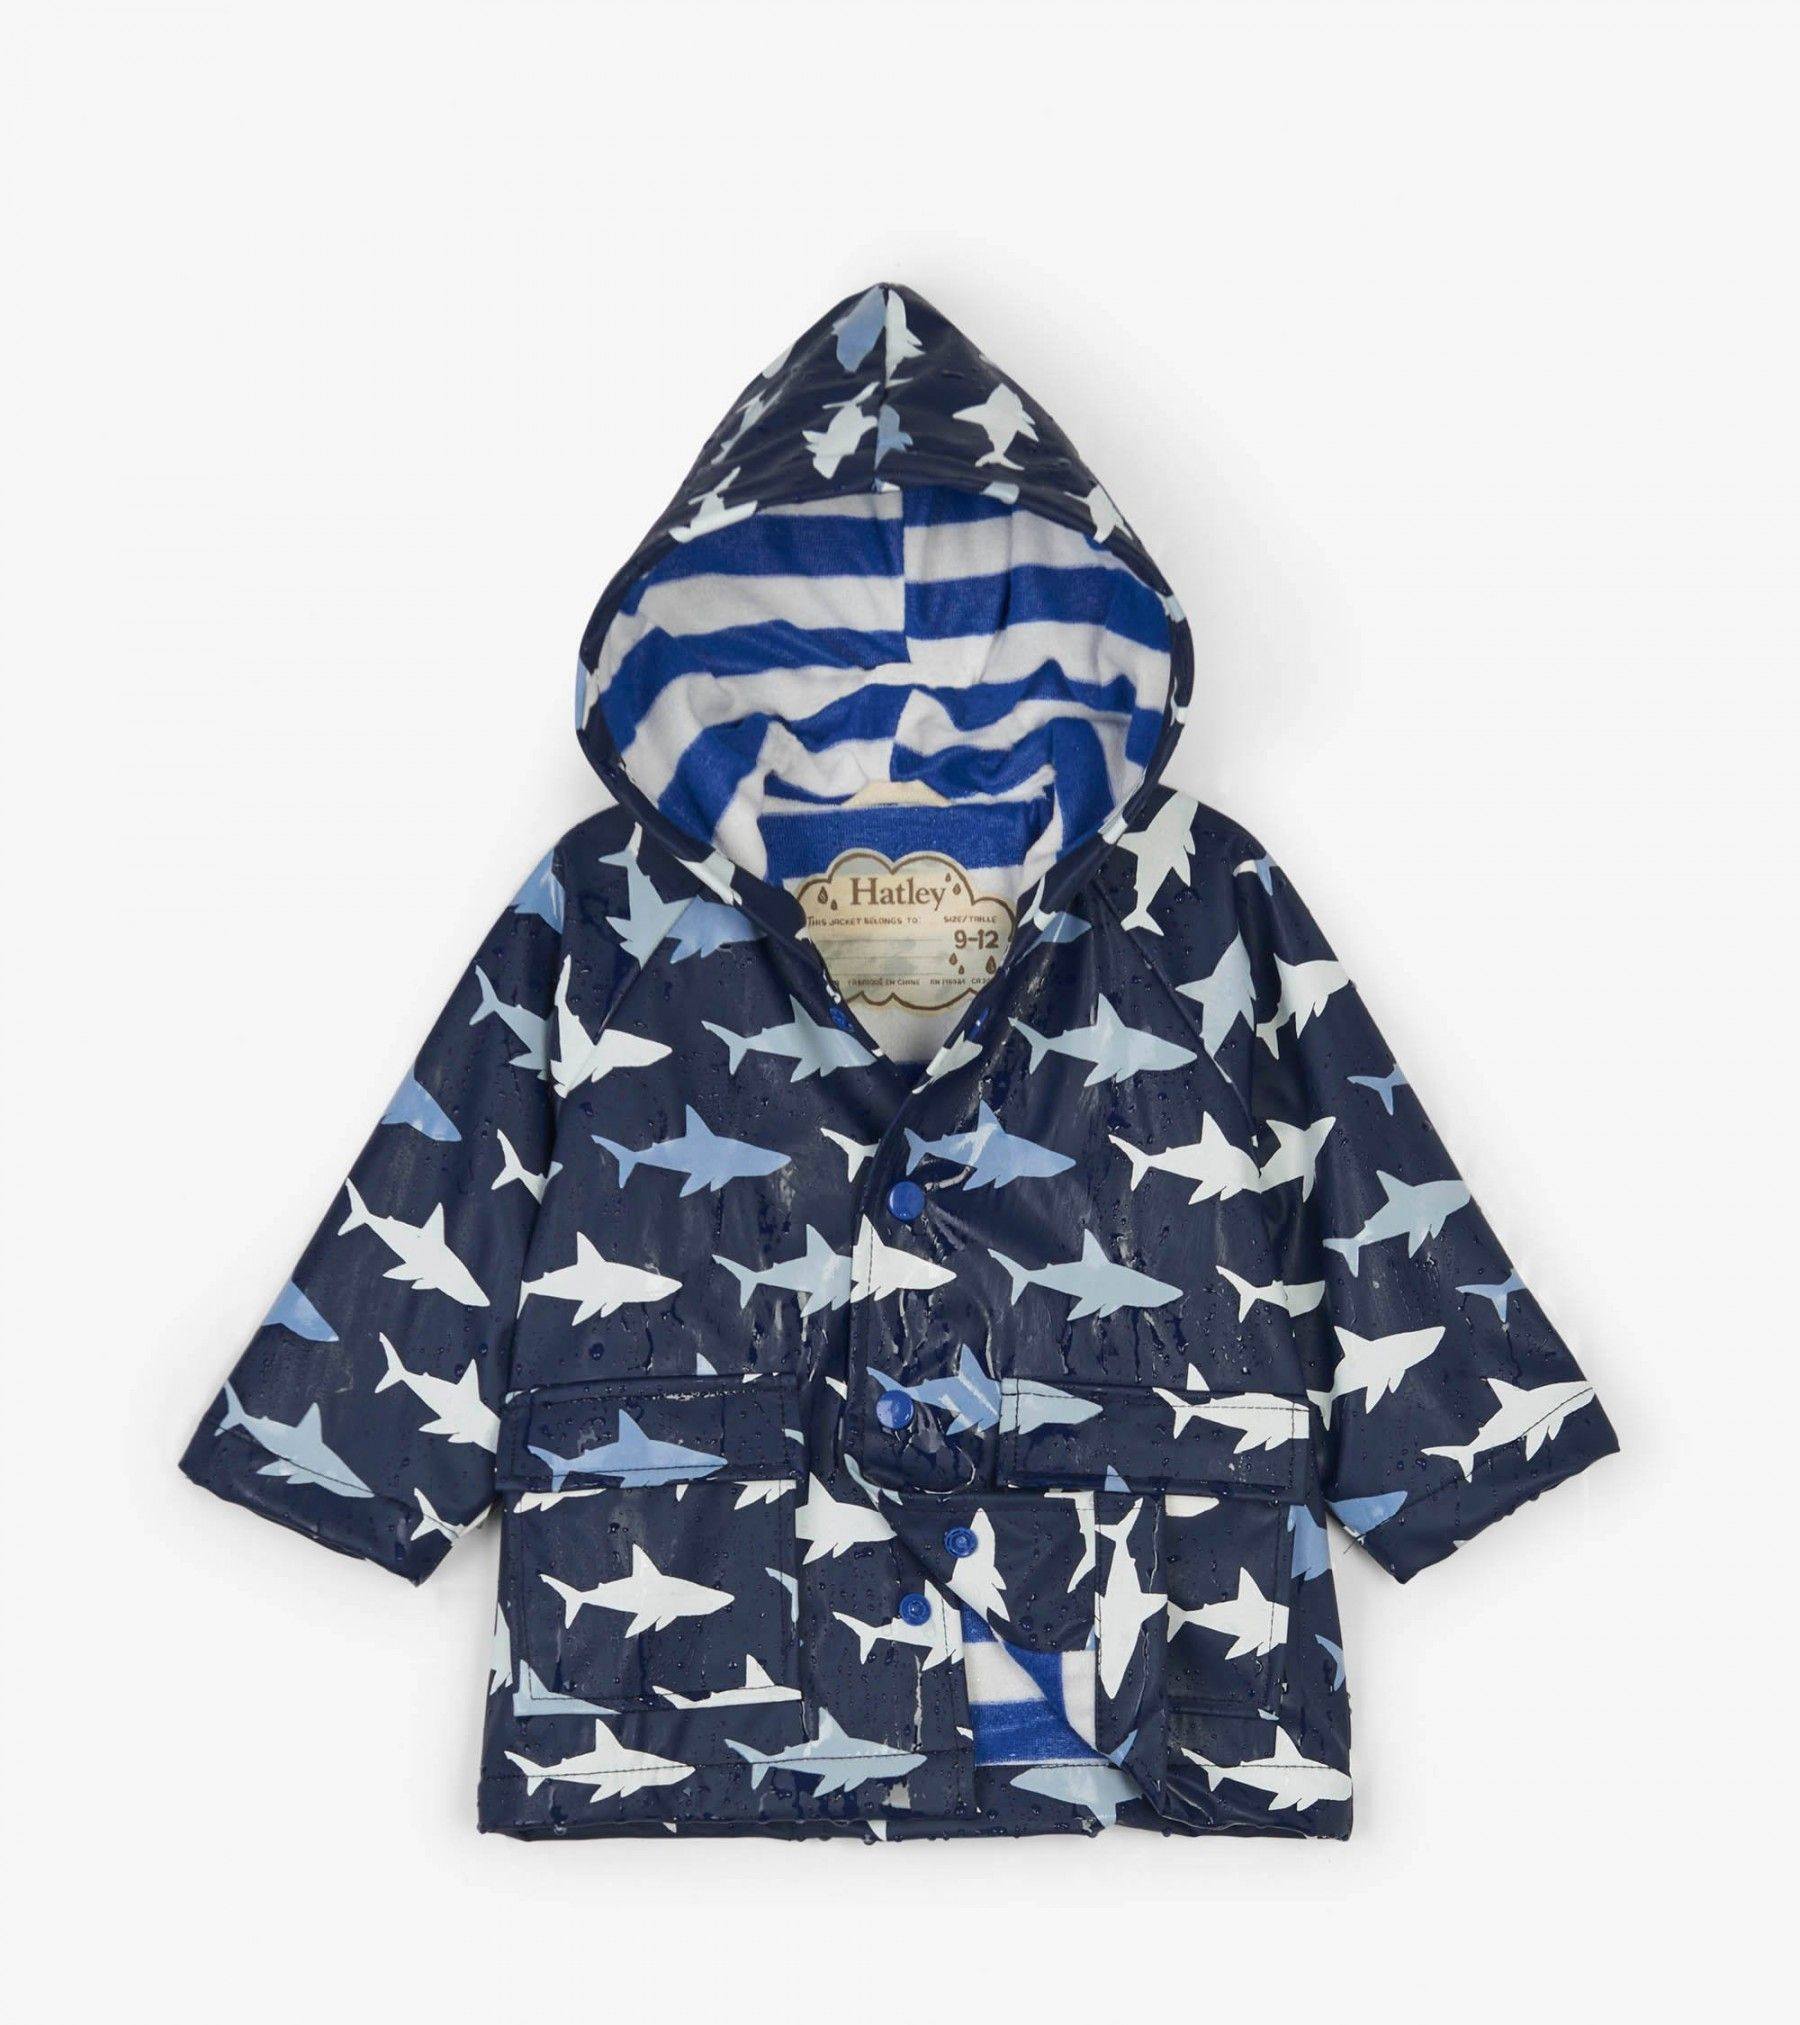 8750fb3b6 Colour Changing Shark Frenzy Baby Raincoat - Rainwear - Categories ...